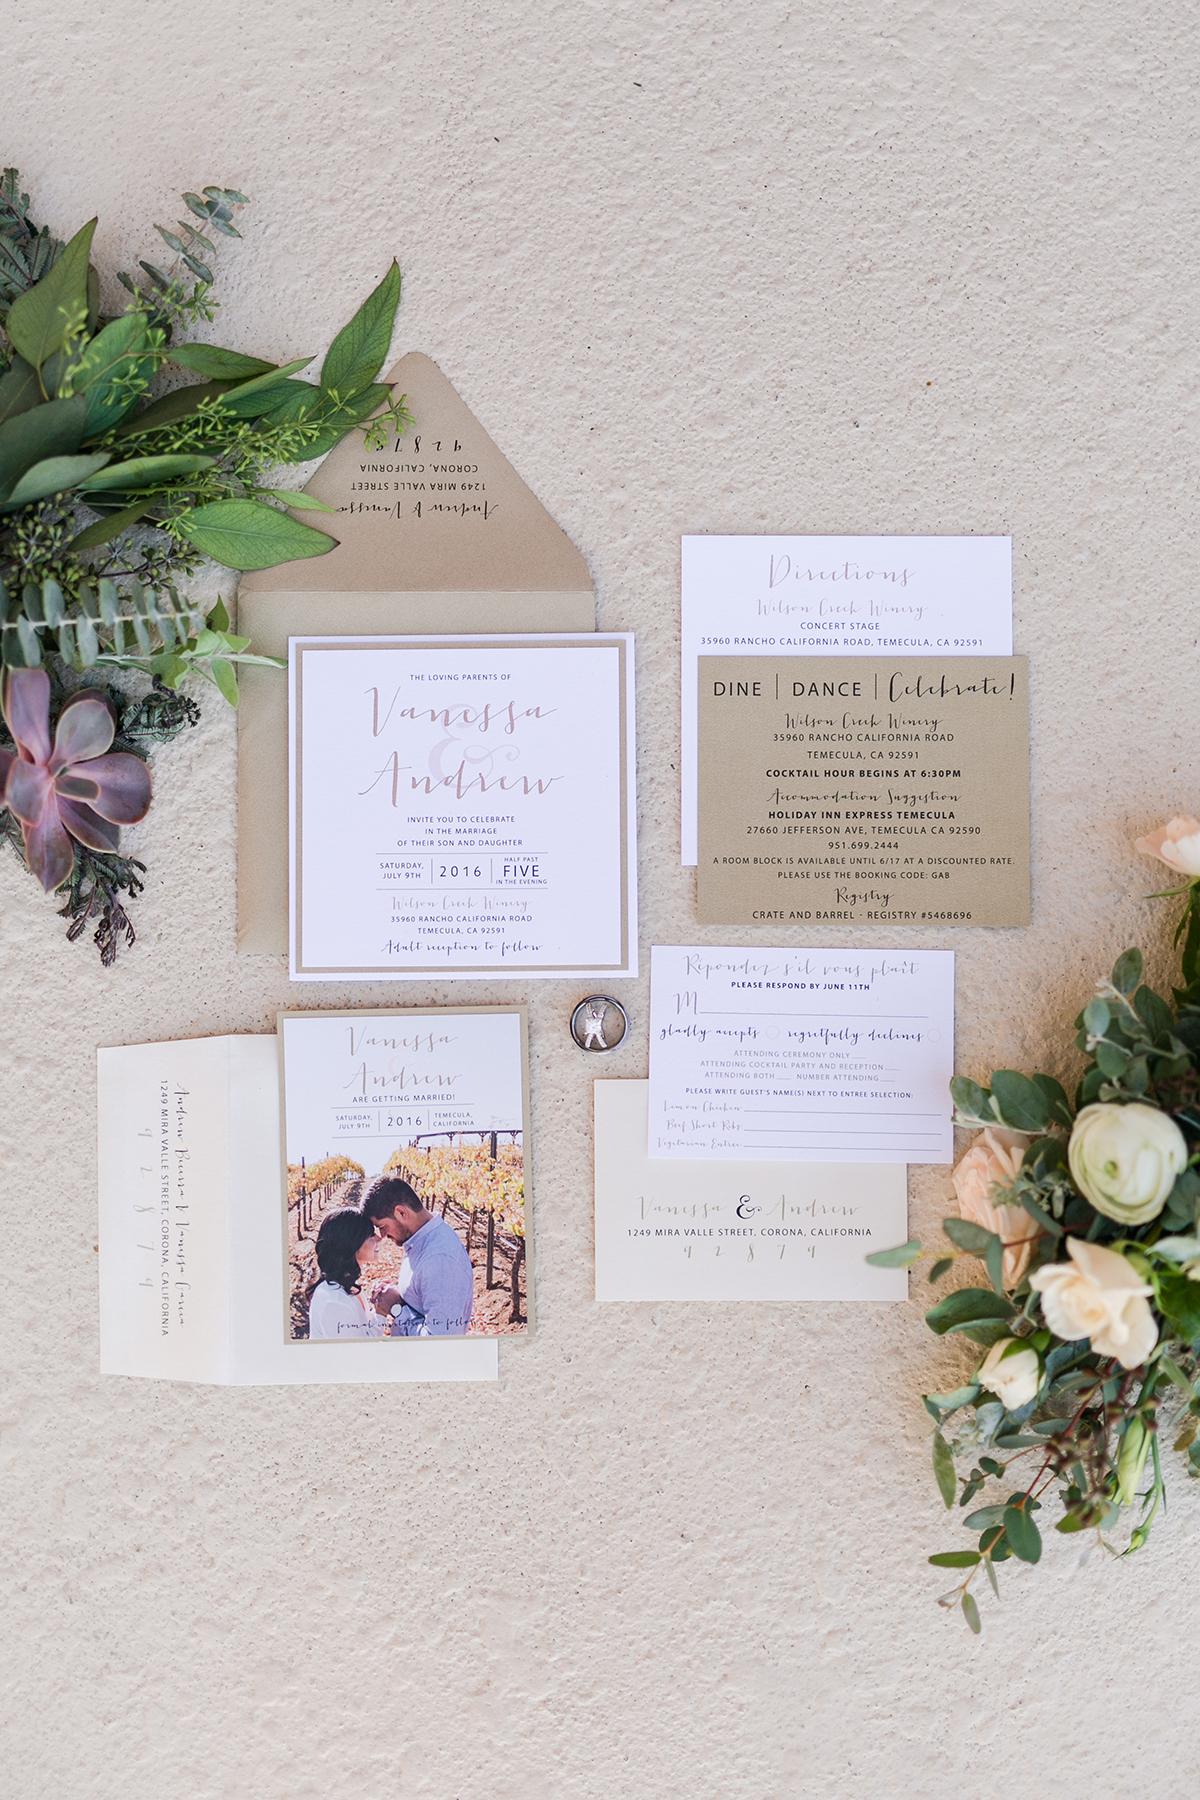 Kraft Paper Wedding Invitations - Elizabeth Anne Designs: The ...